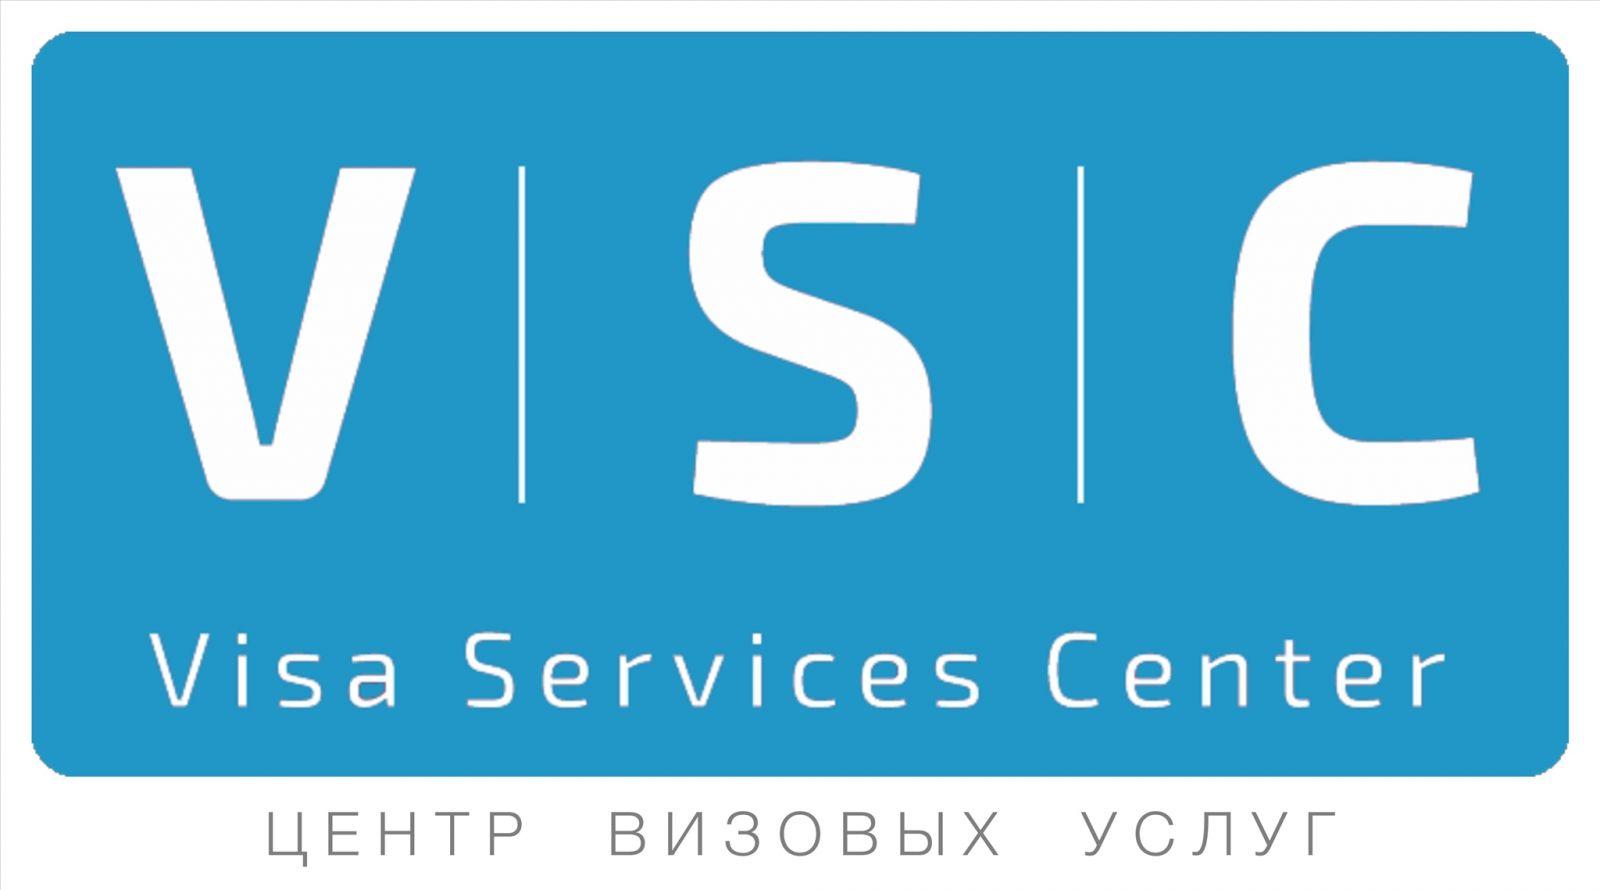 Visa Services Center